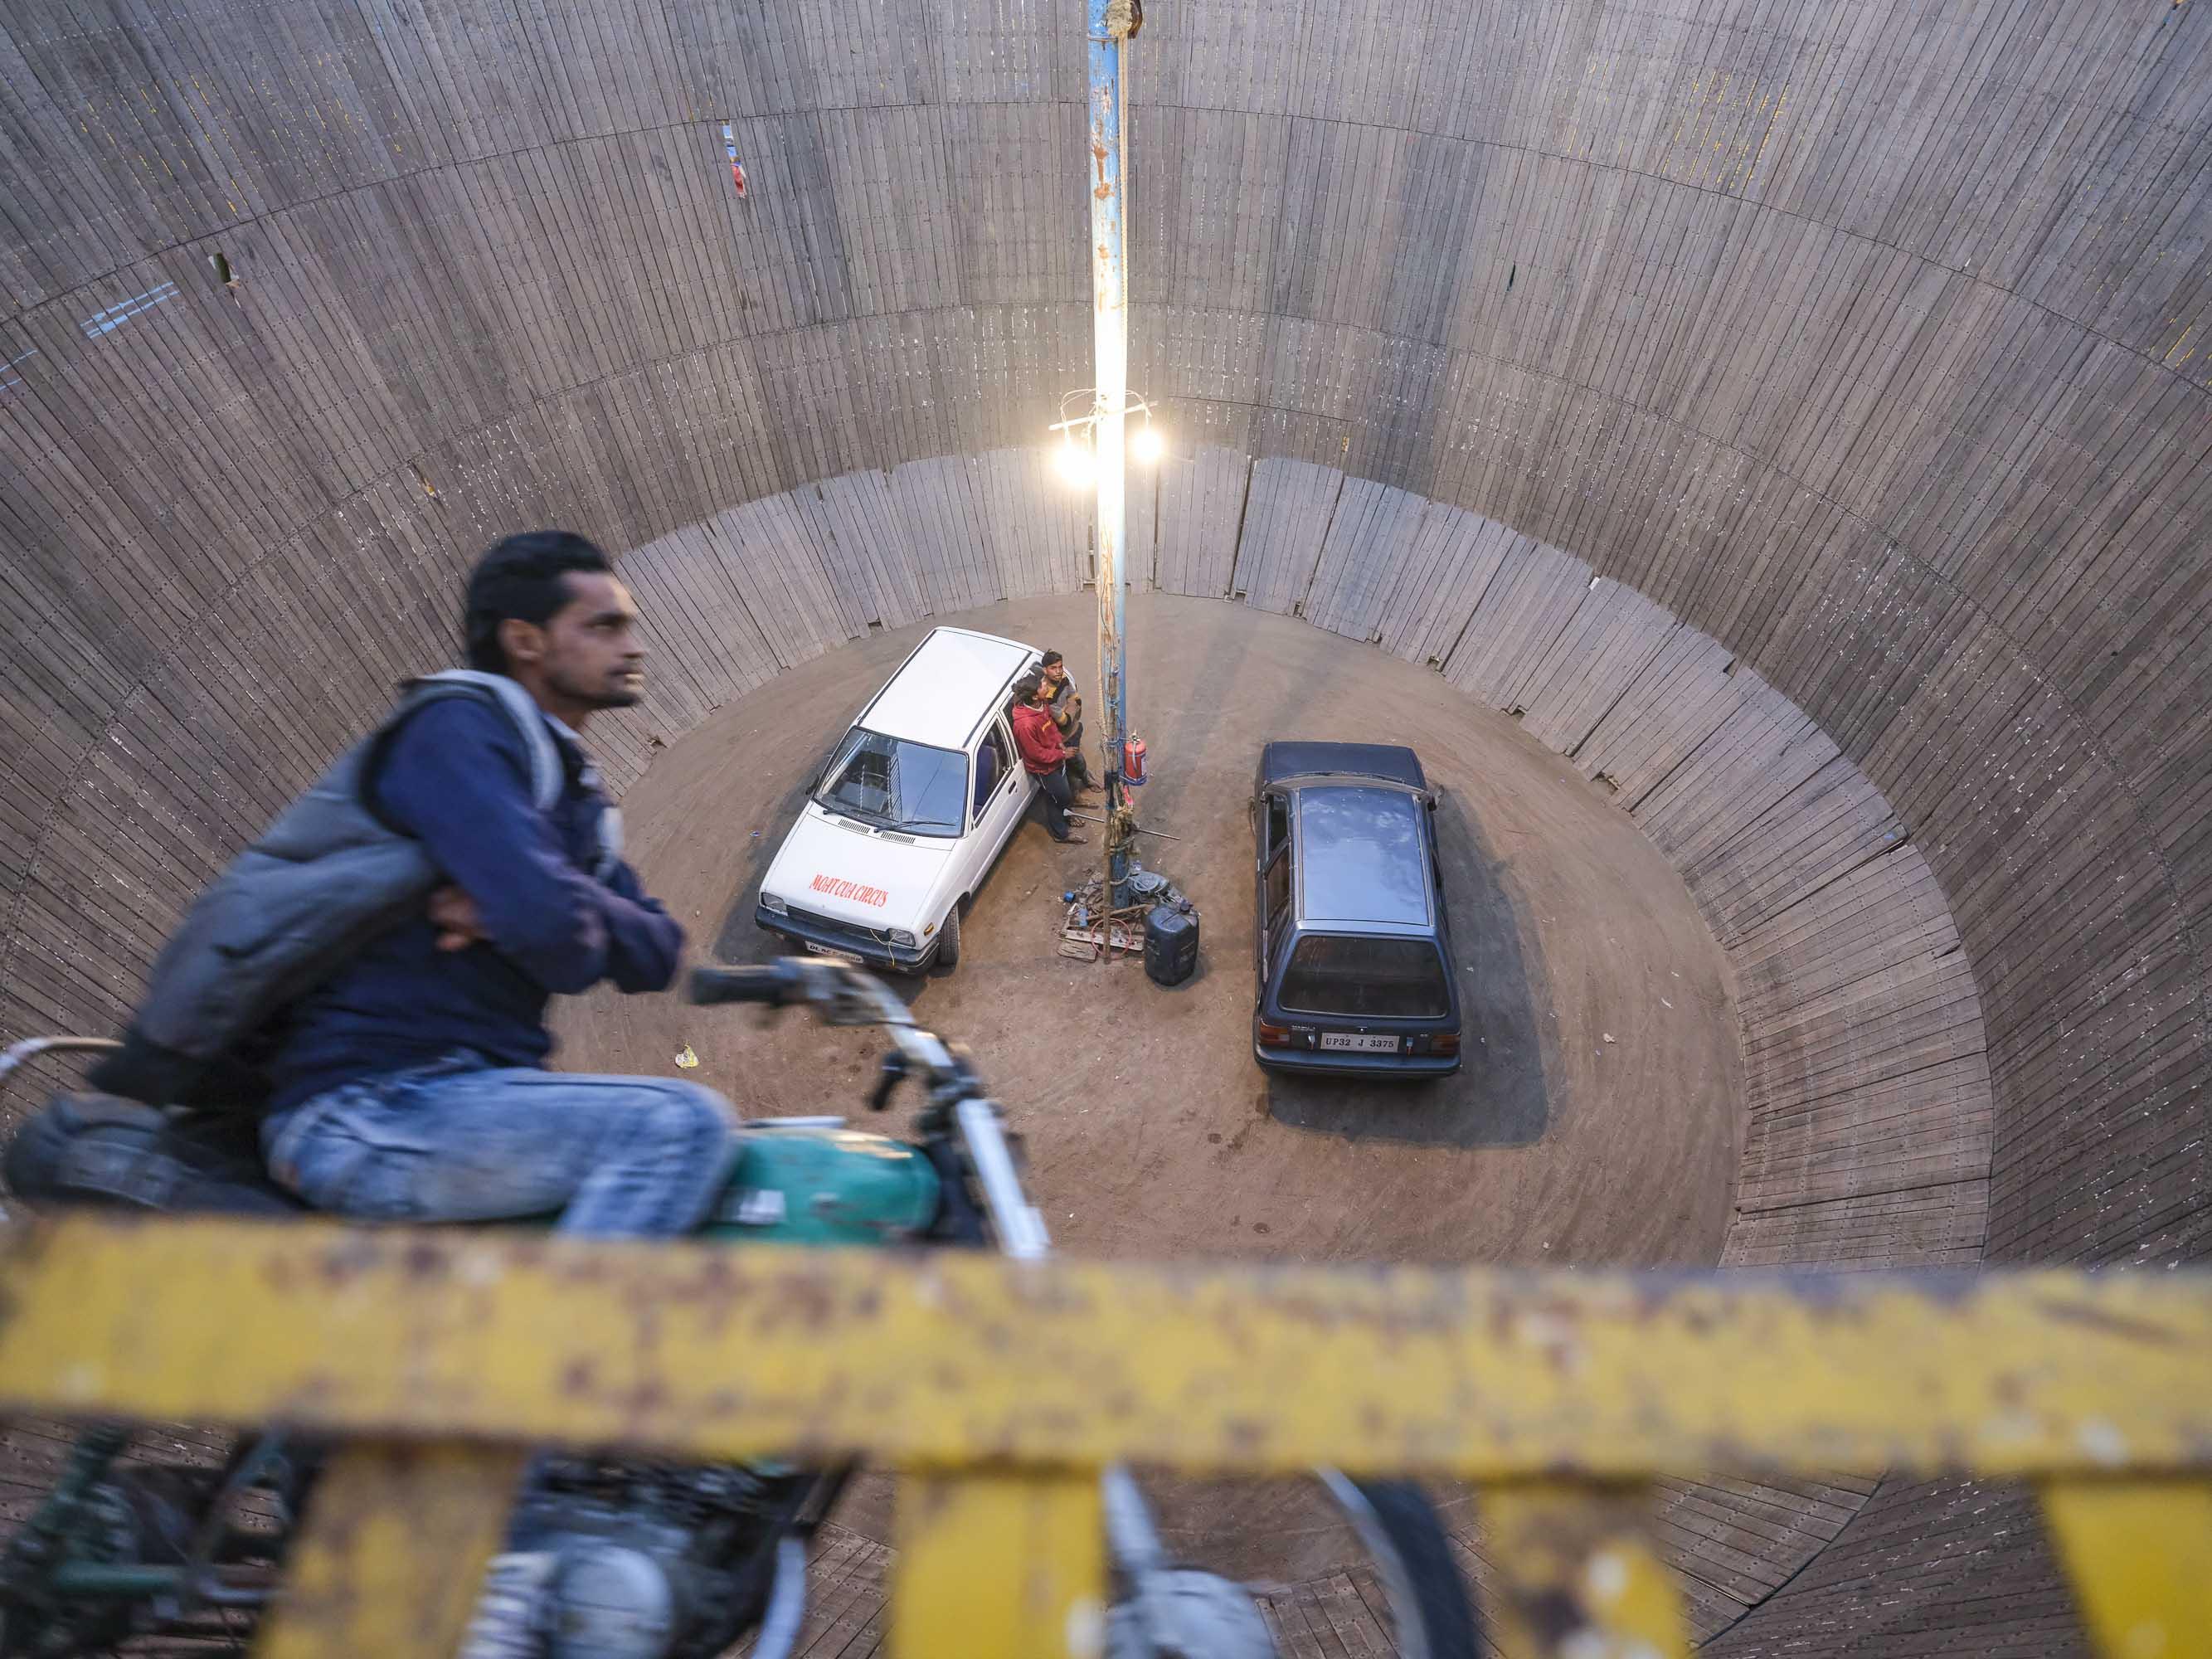 motor guy death wall pilgrims Kumbh mela 2019 India Allahabad Prayagraj Ardh hindu religious Festival event rivers photographer jose jeuland photography